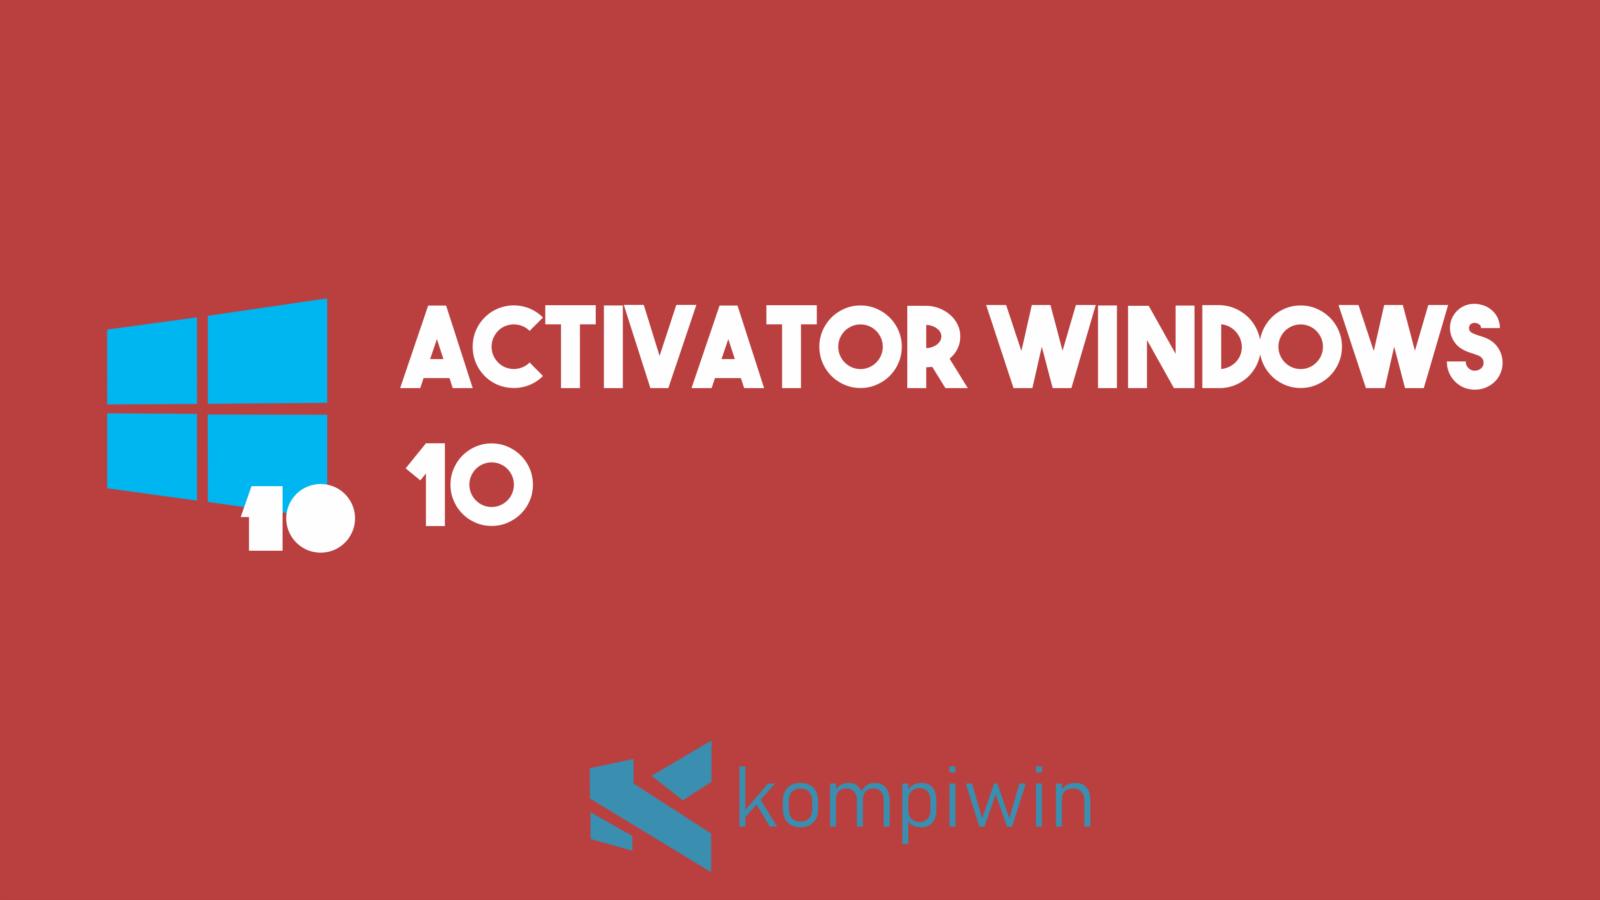 Activator Windows 10 1